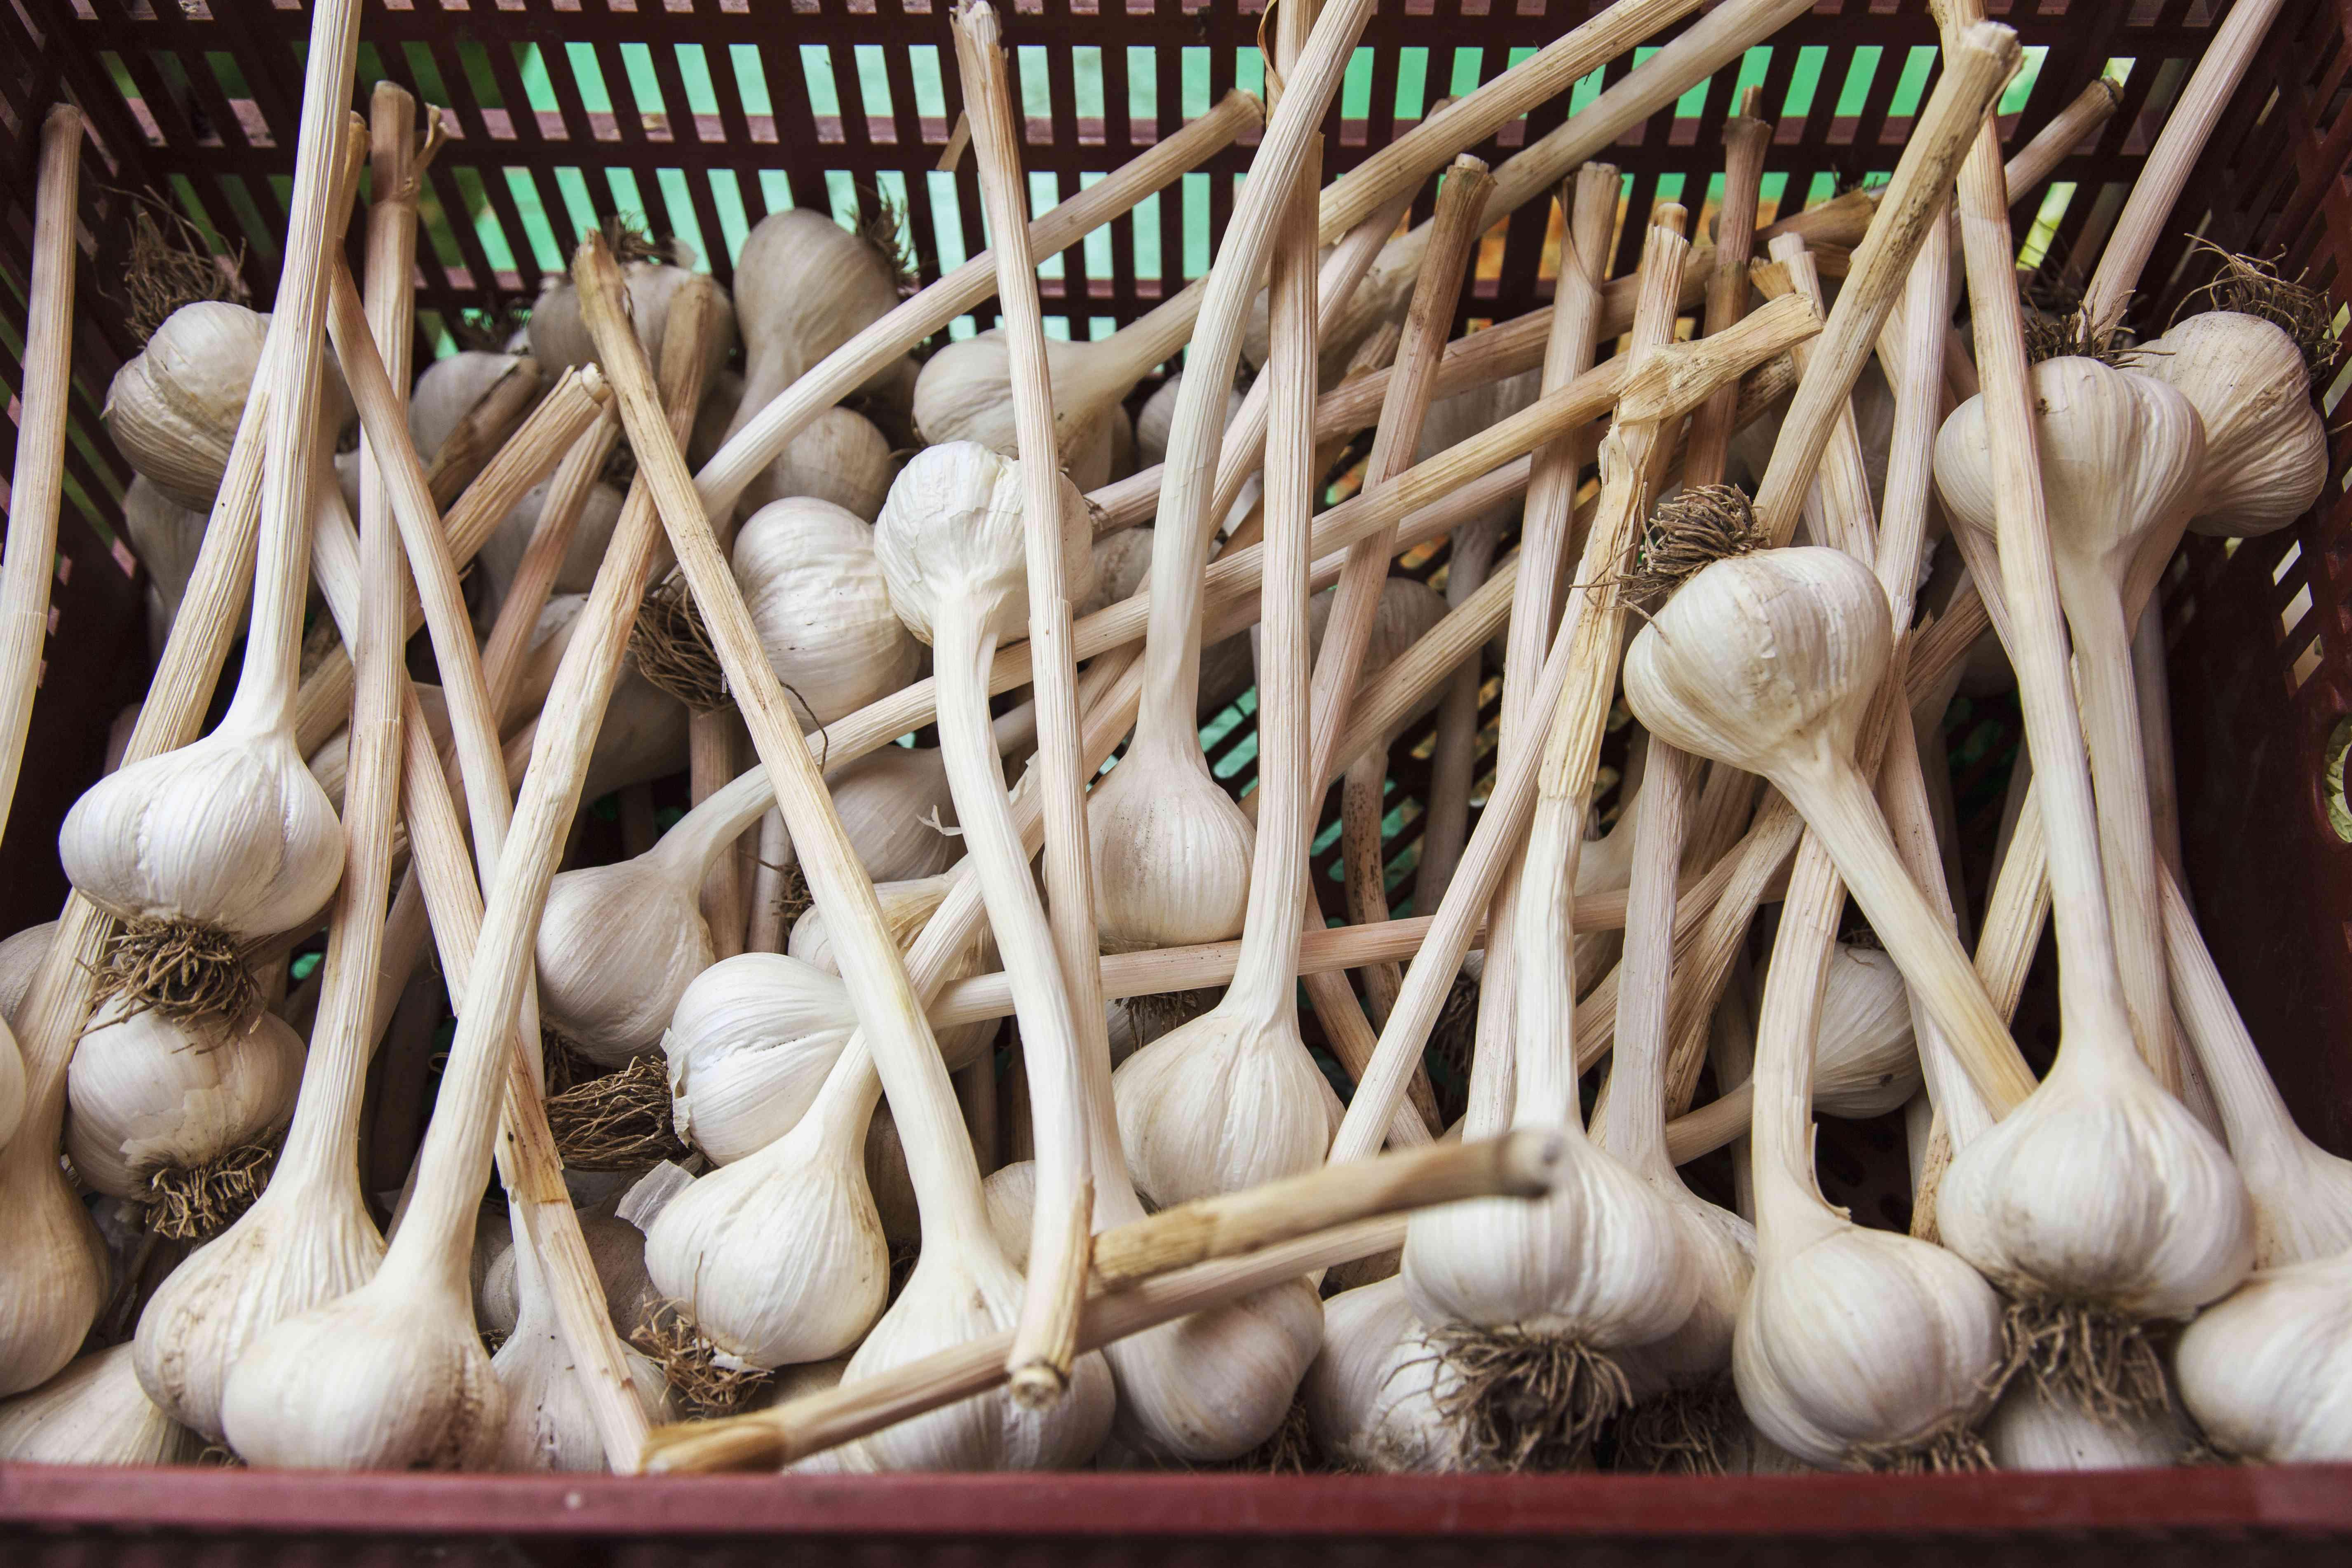 Large clean organically grown hardneck garlic bulbs